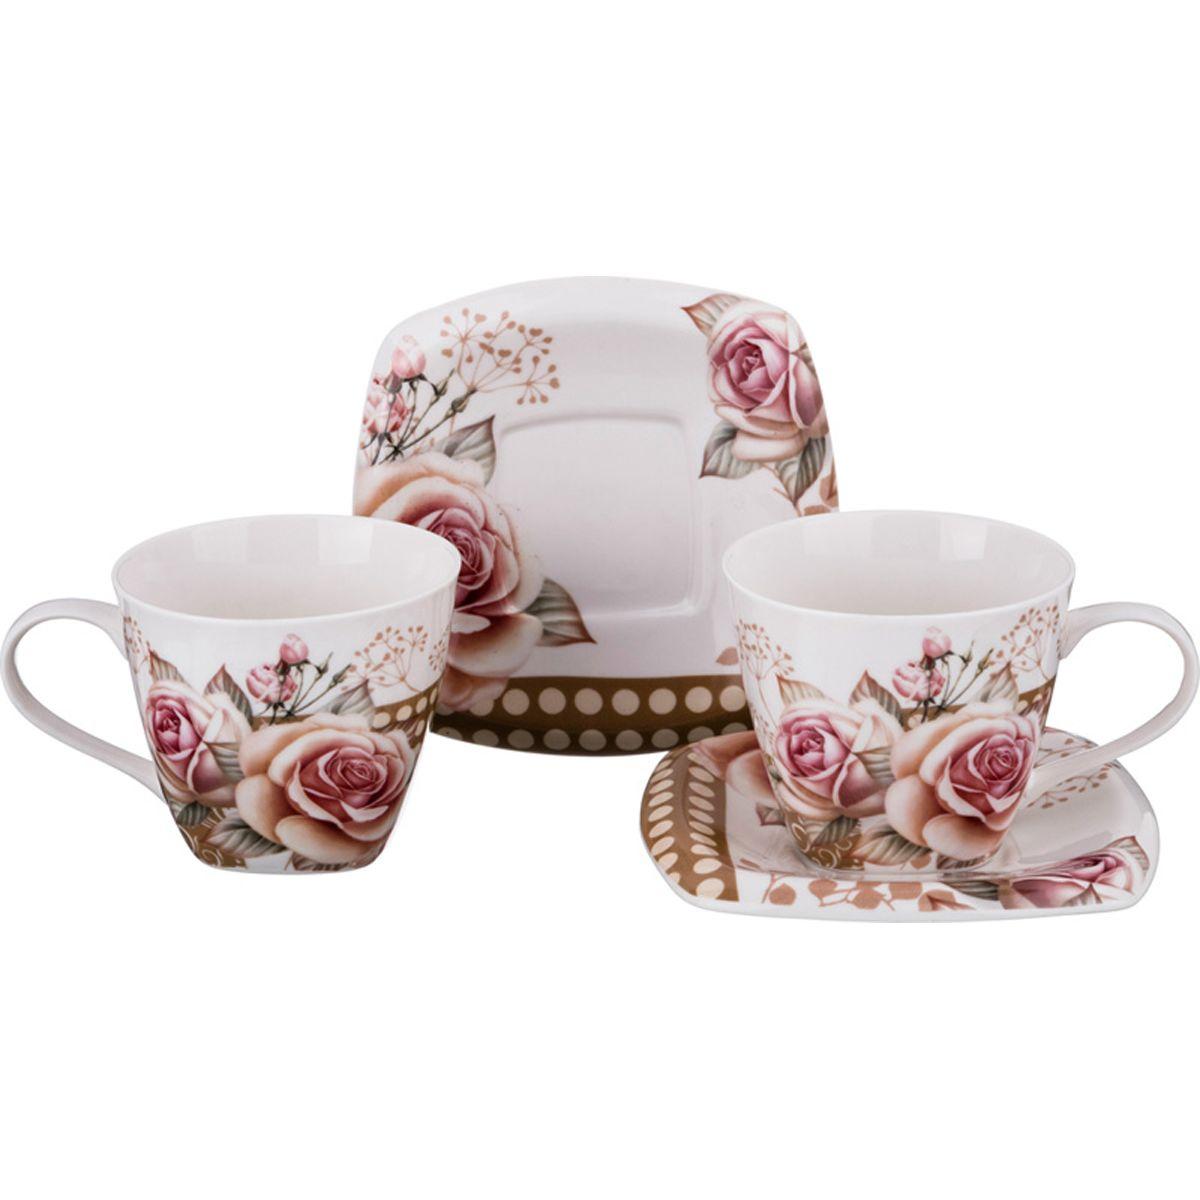 Набор чайный Lefard ''Бархатная роза'' на 2 персоны, LF-165/395, 220 мл набор чайный на 2 персоны c622as622a l6 yg01 2 розовый 4 предмета